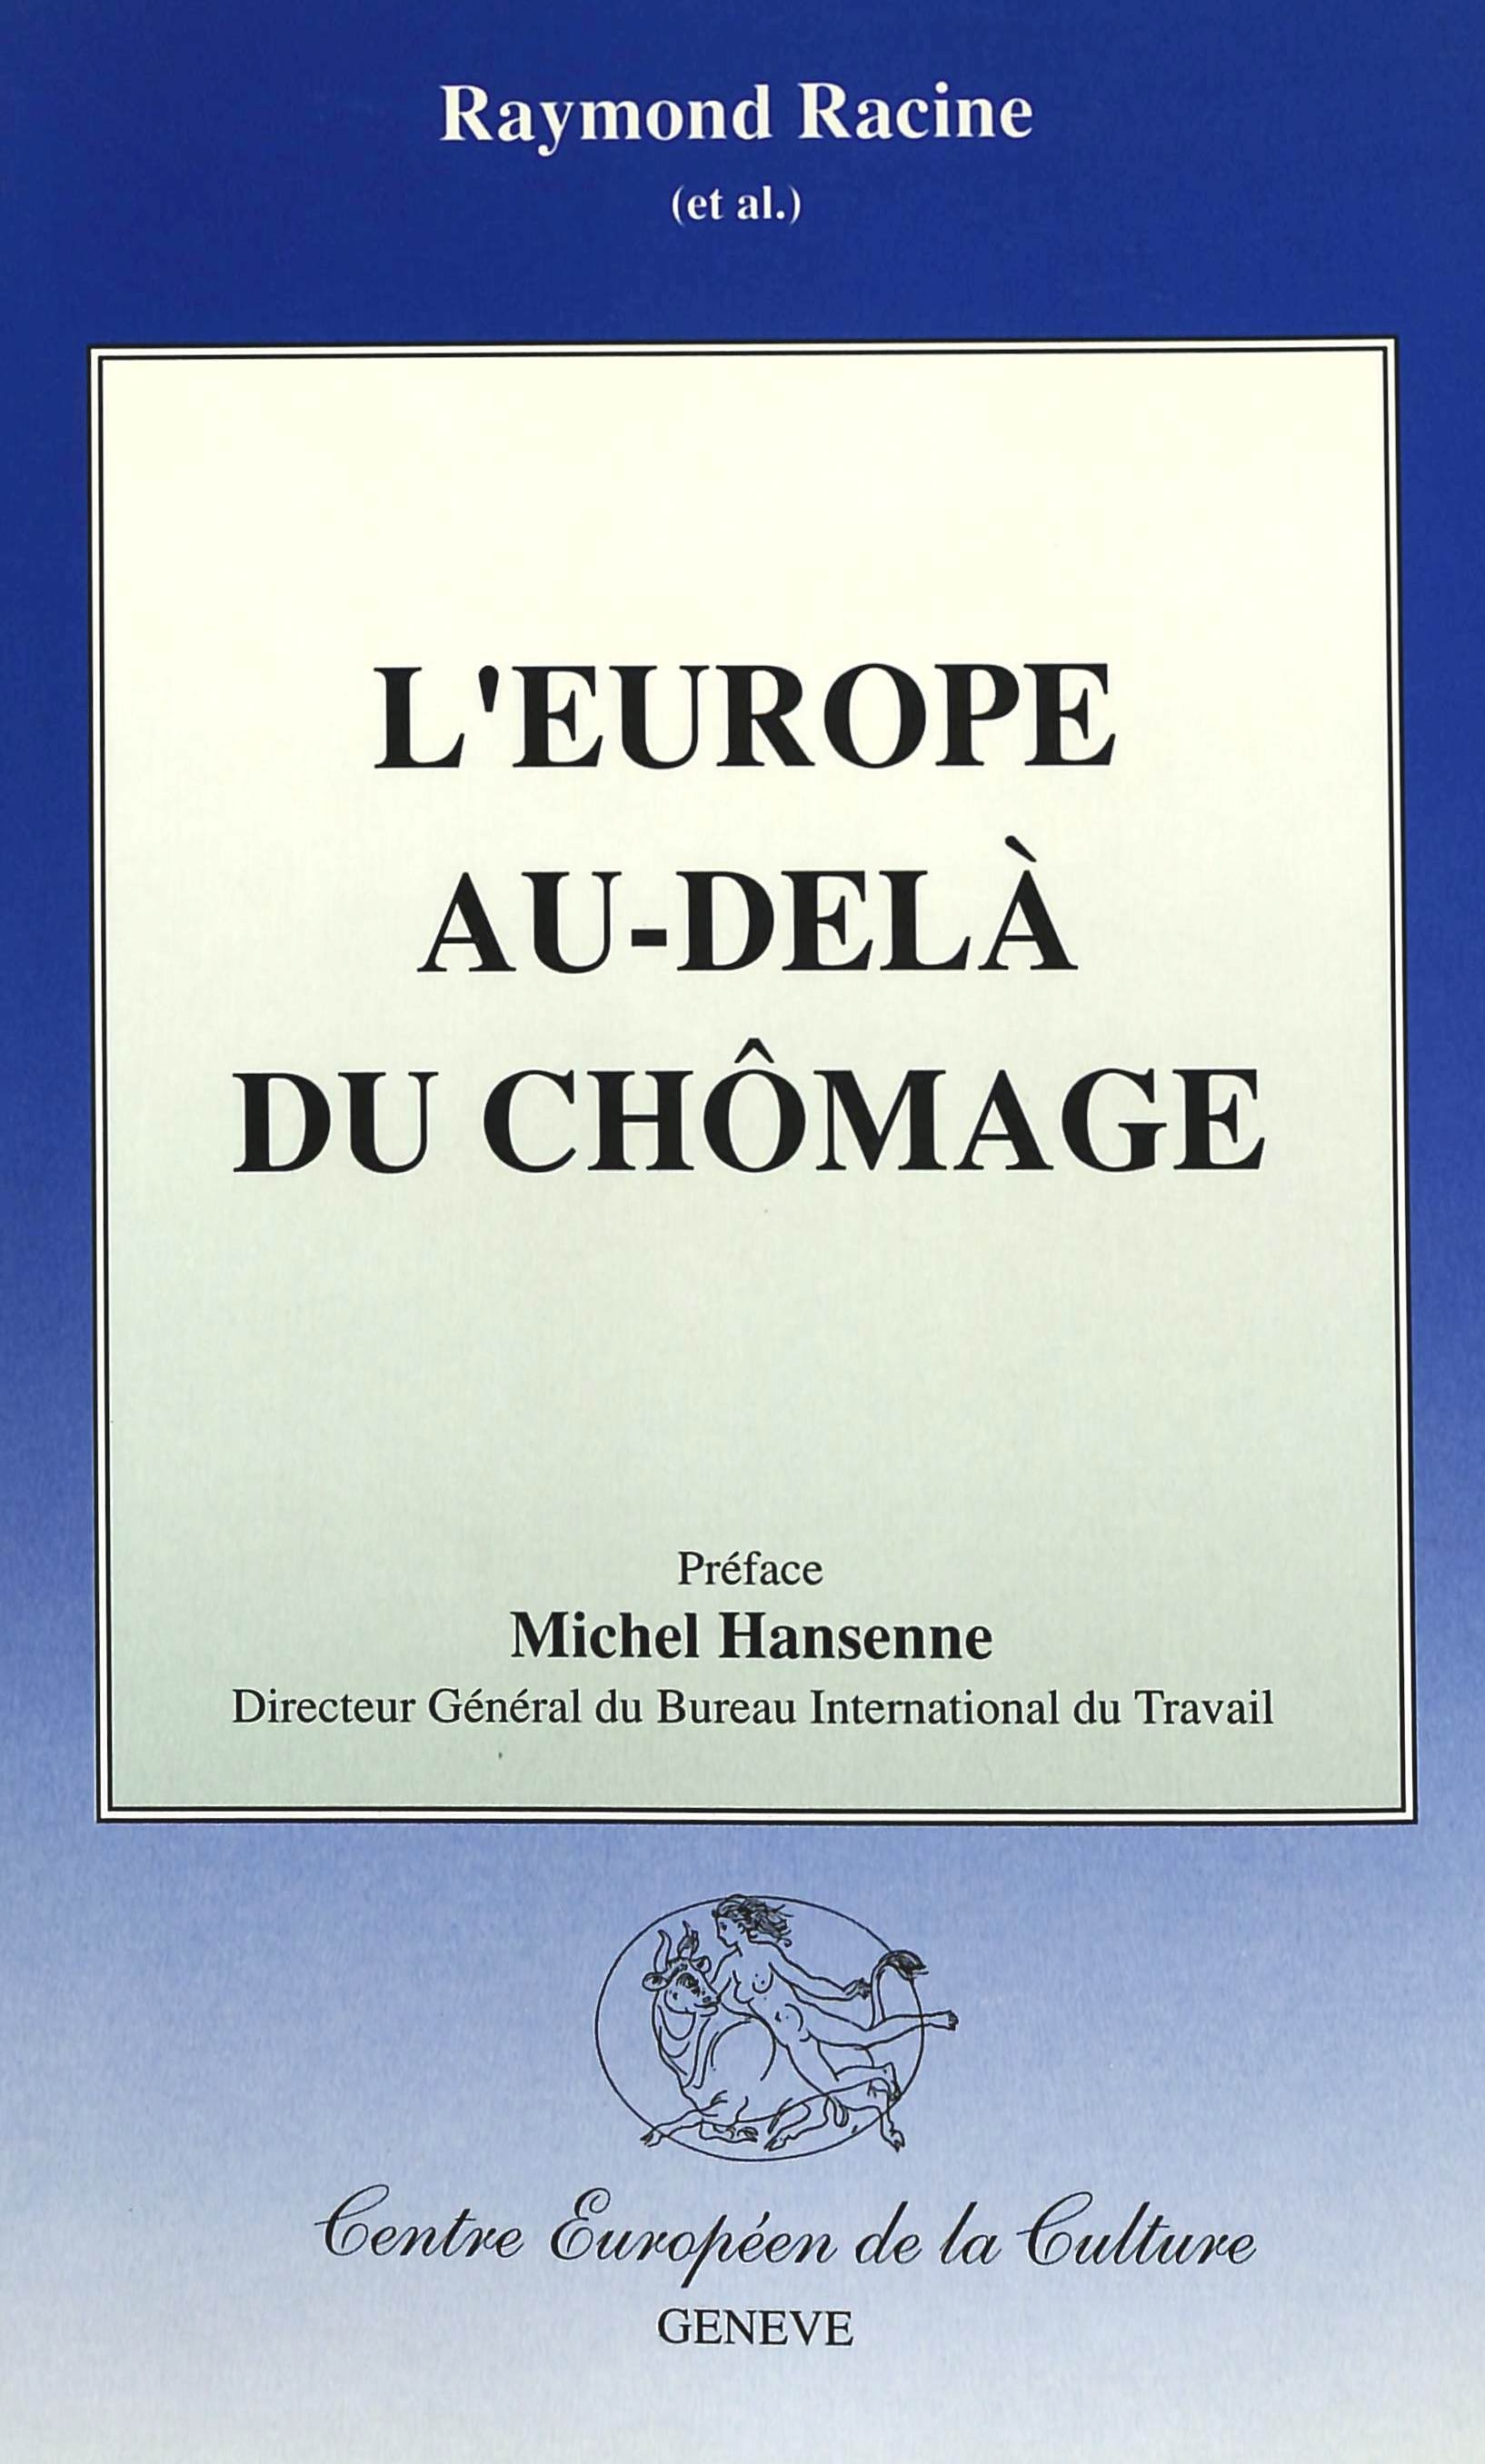 L'EUROPE AU-DELA DU CHOMAGE